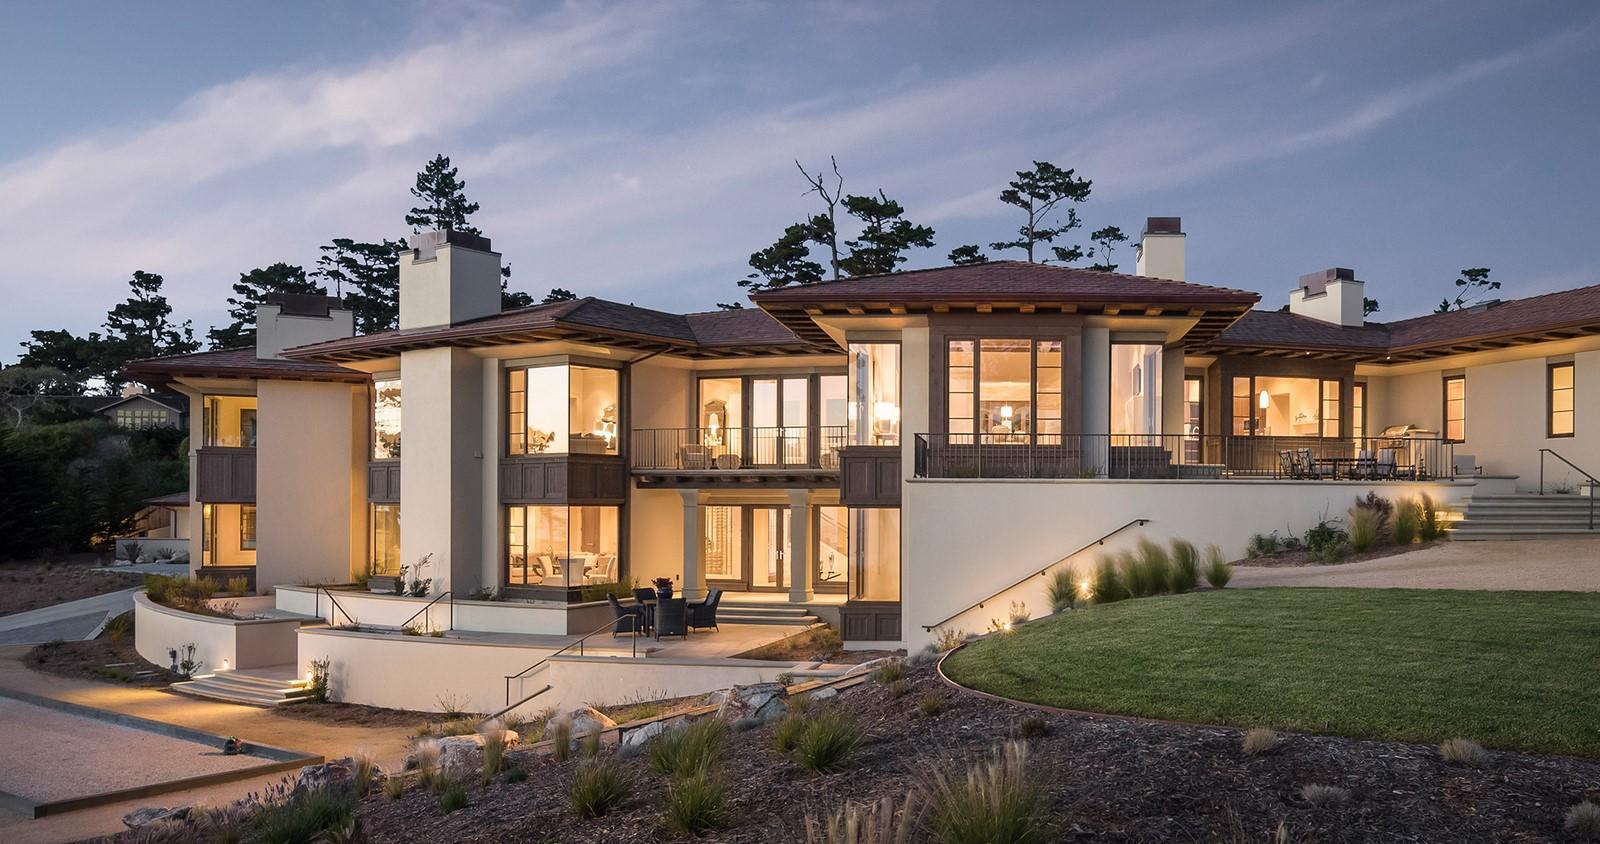 Pebble Beach Residence - Sheet3